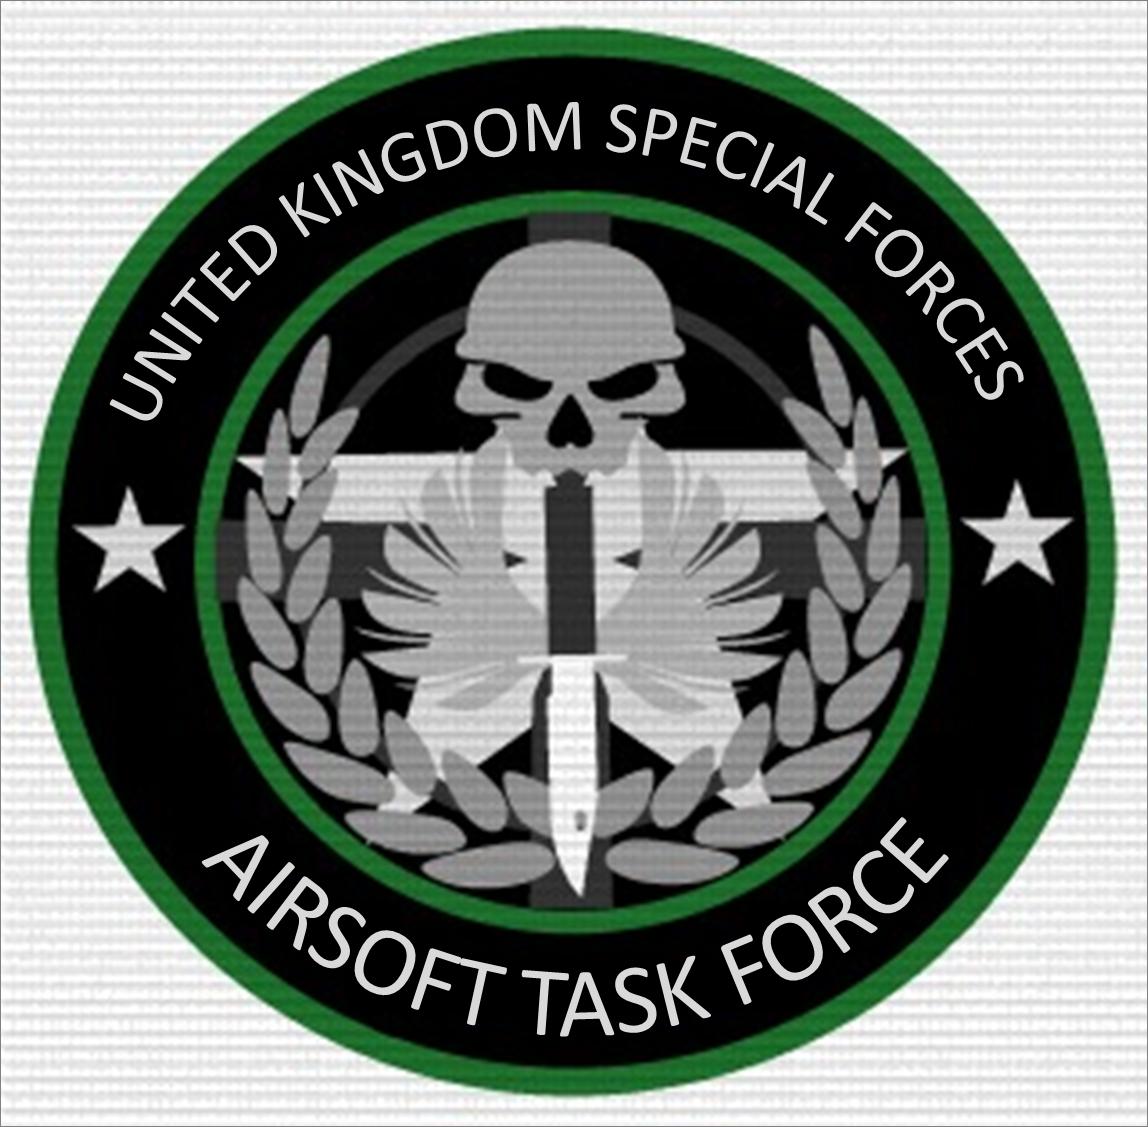 Image Personal Atf Logo 1g Call Of Duty Wiki Fandom Powered